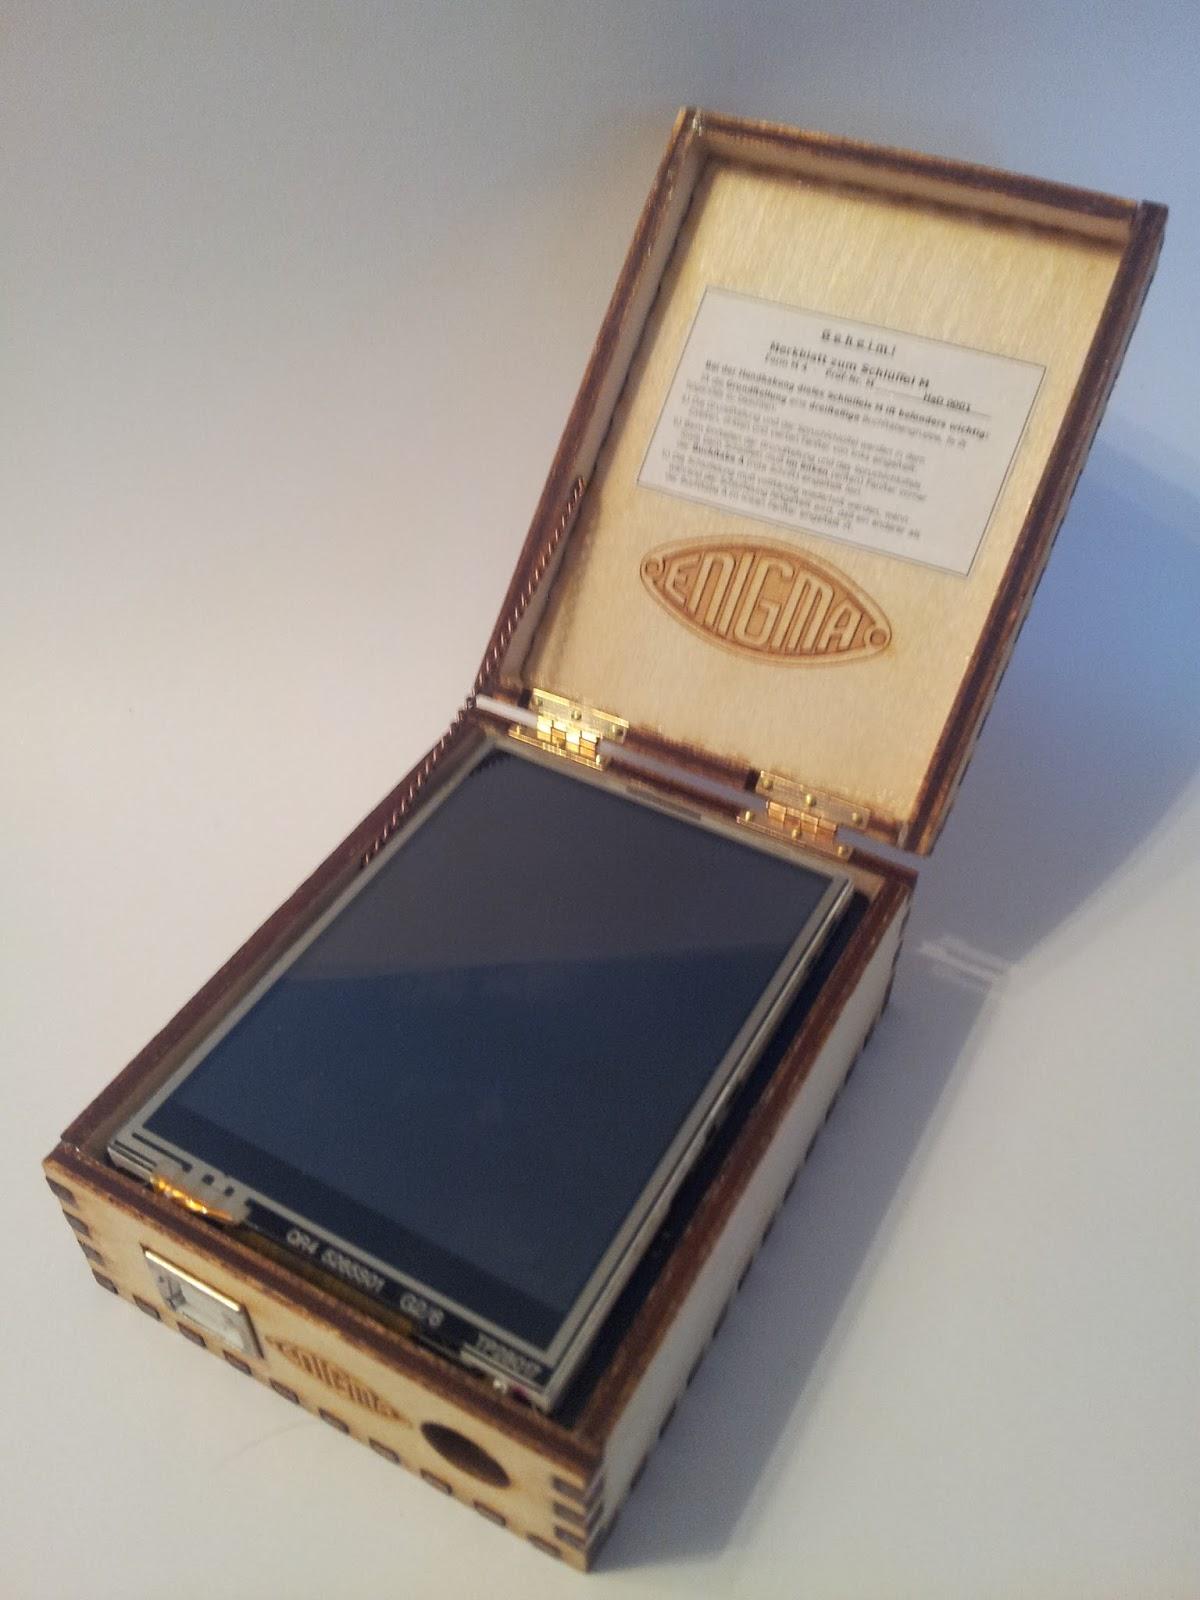 enigma machine for sale on ebay